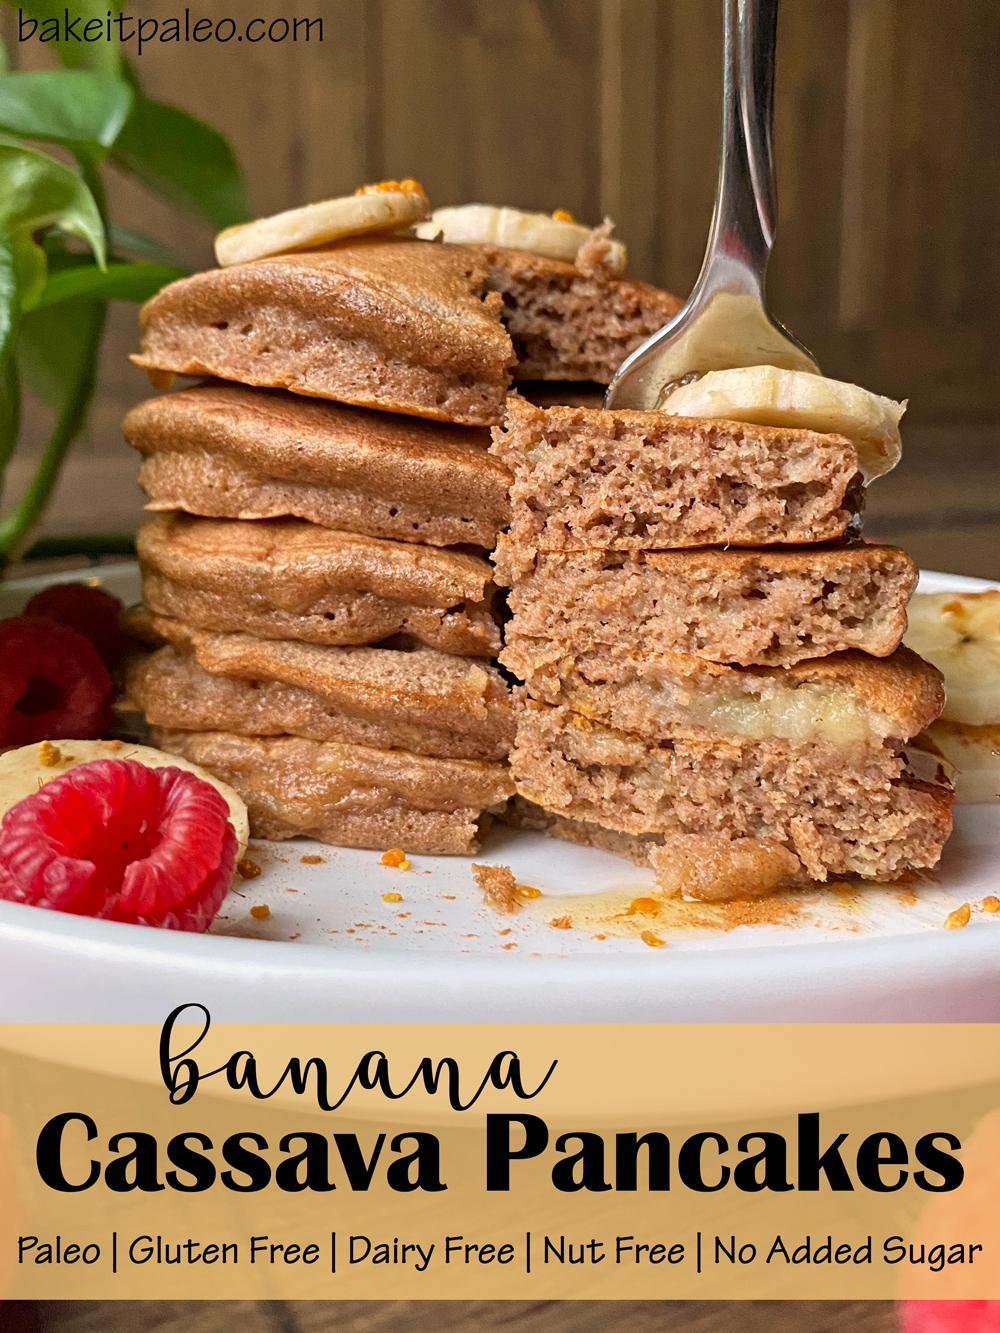 cassava-flour-breakfast-recipes